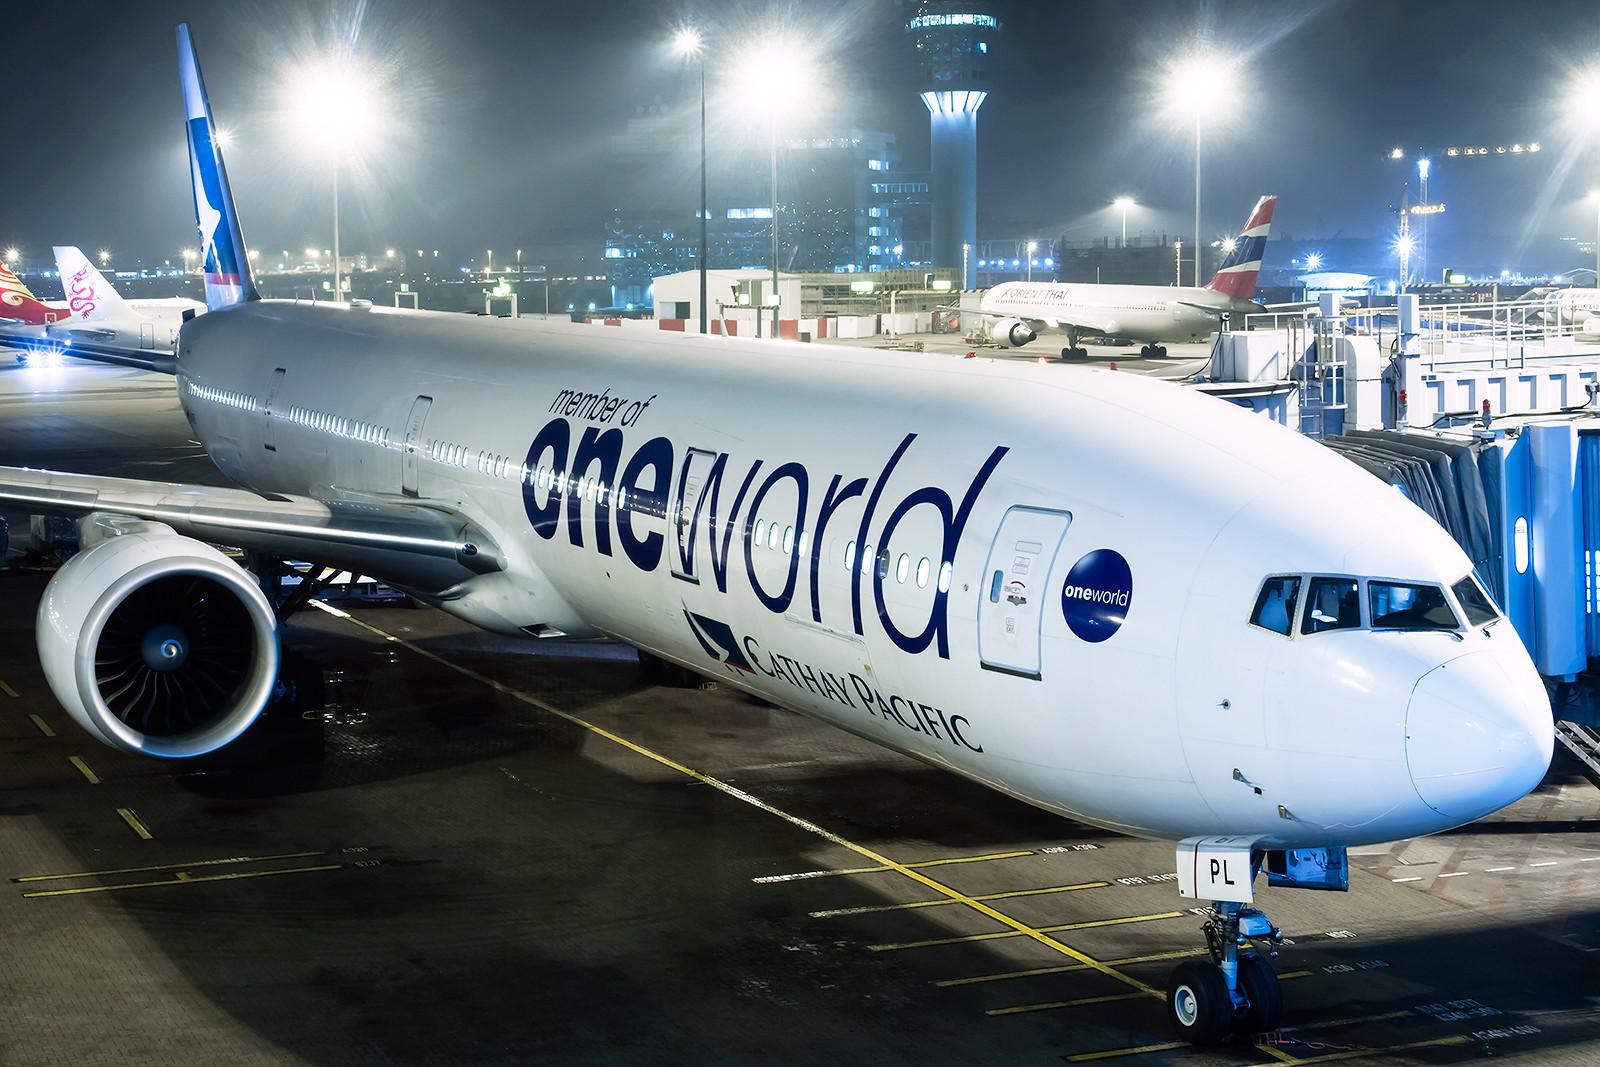 Re:[原创]夜太美 BOEING 777-300ER B-KPL 中国香港赤鱲角国际机场